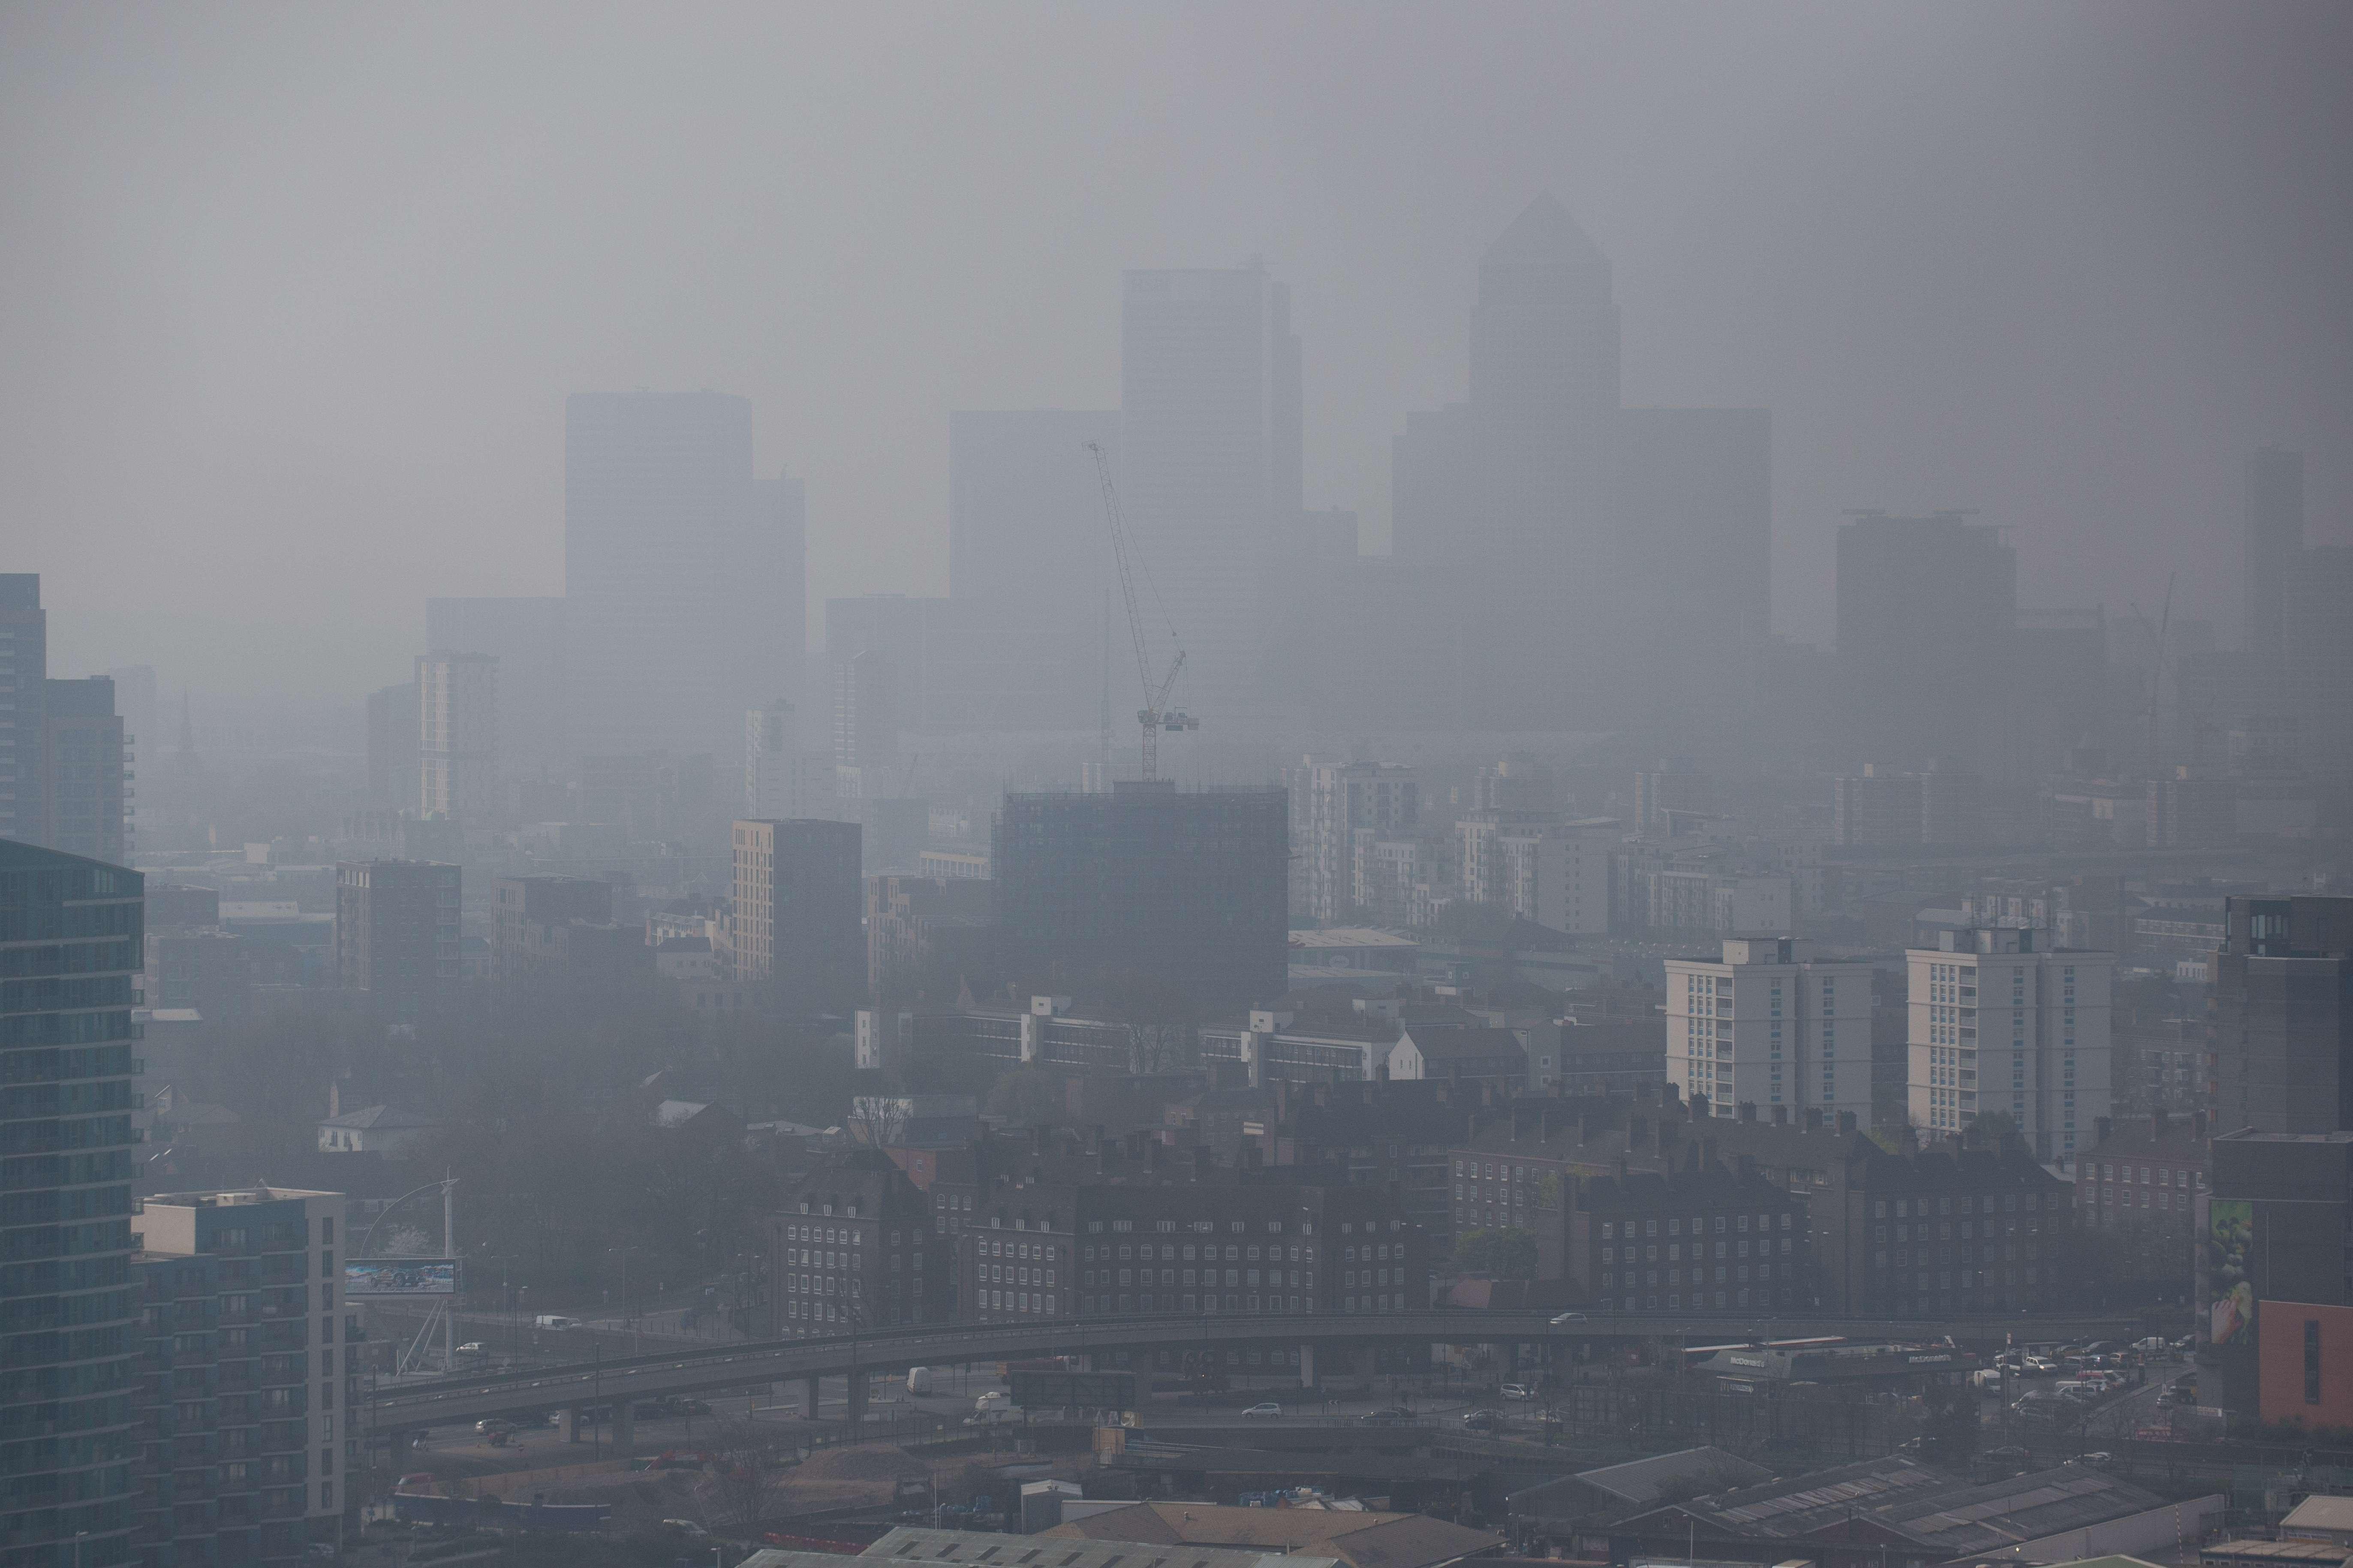 Air pollution hangs in the air lowering